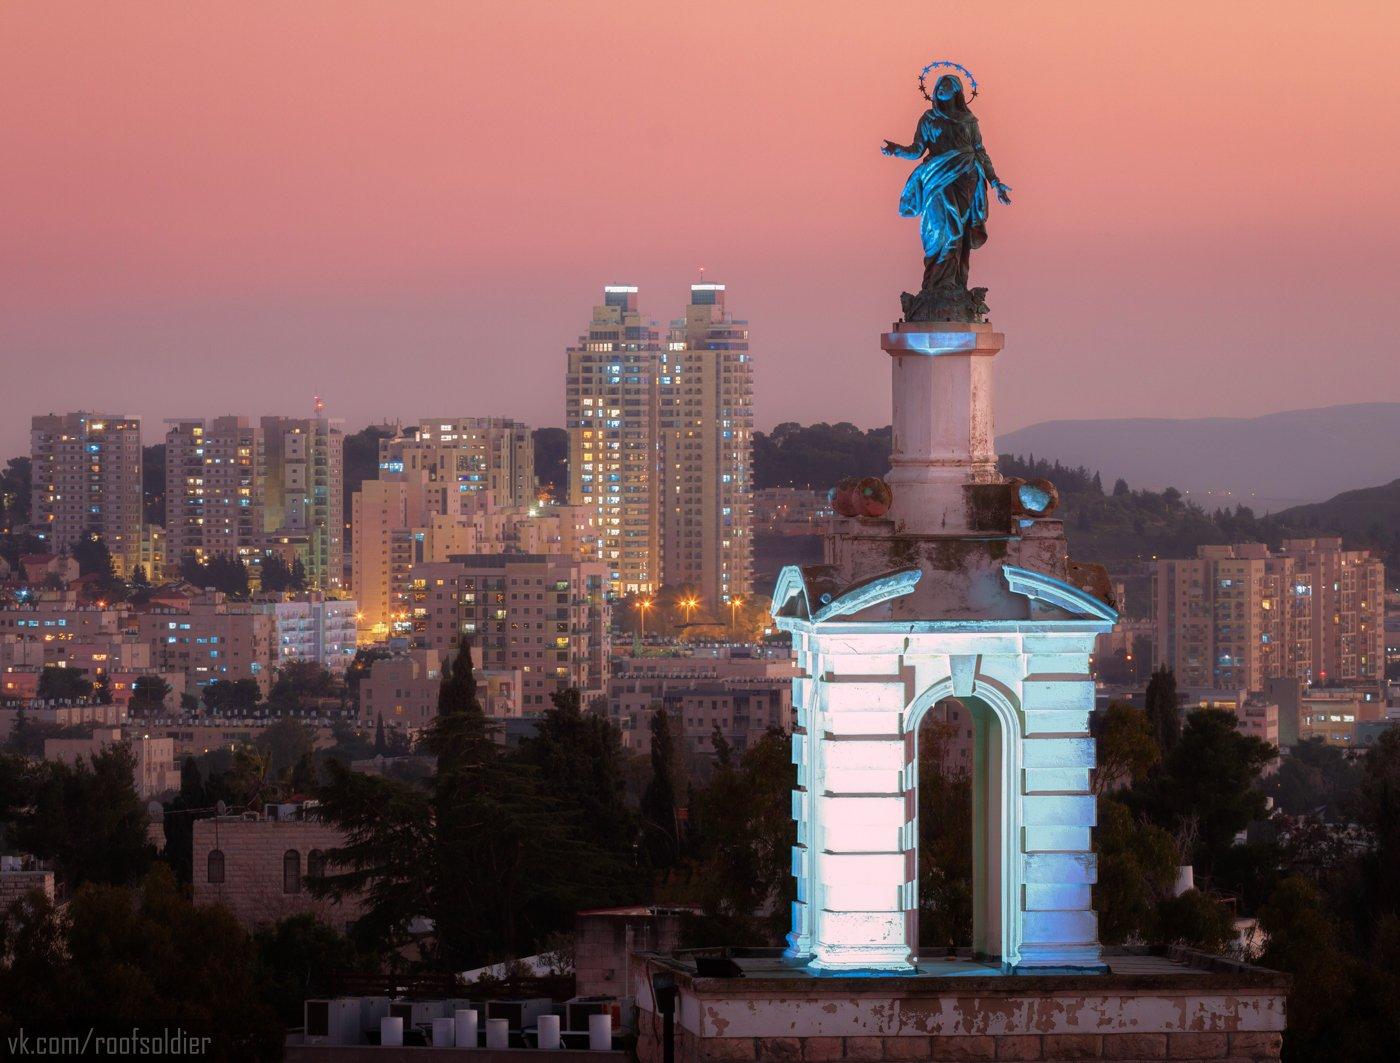 Jerusalem, Israel, sunset, sculpture, madonna, religion, roof, архитектура, крыша, скульптура, Израиль, Иерусалим, закат, Мадонна, религия, Голубев Алексей